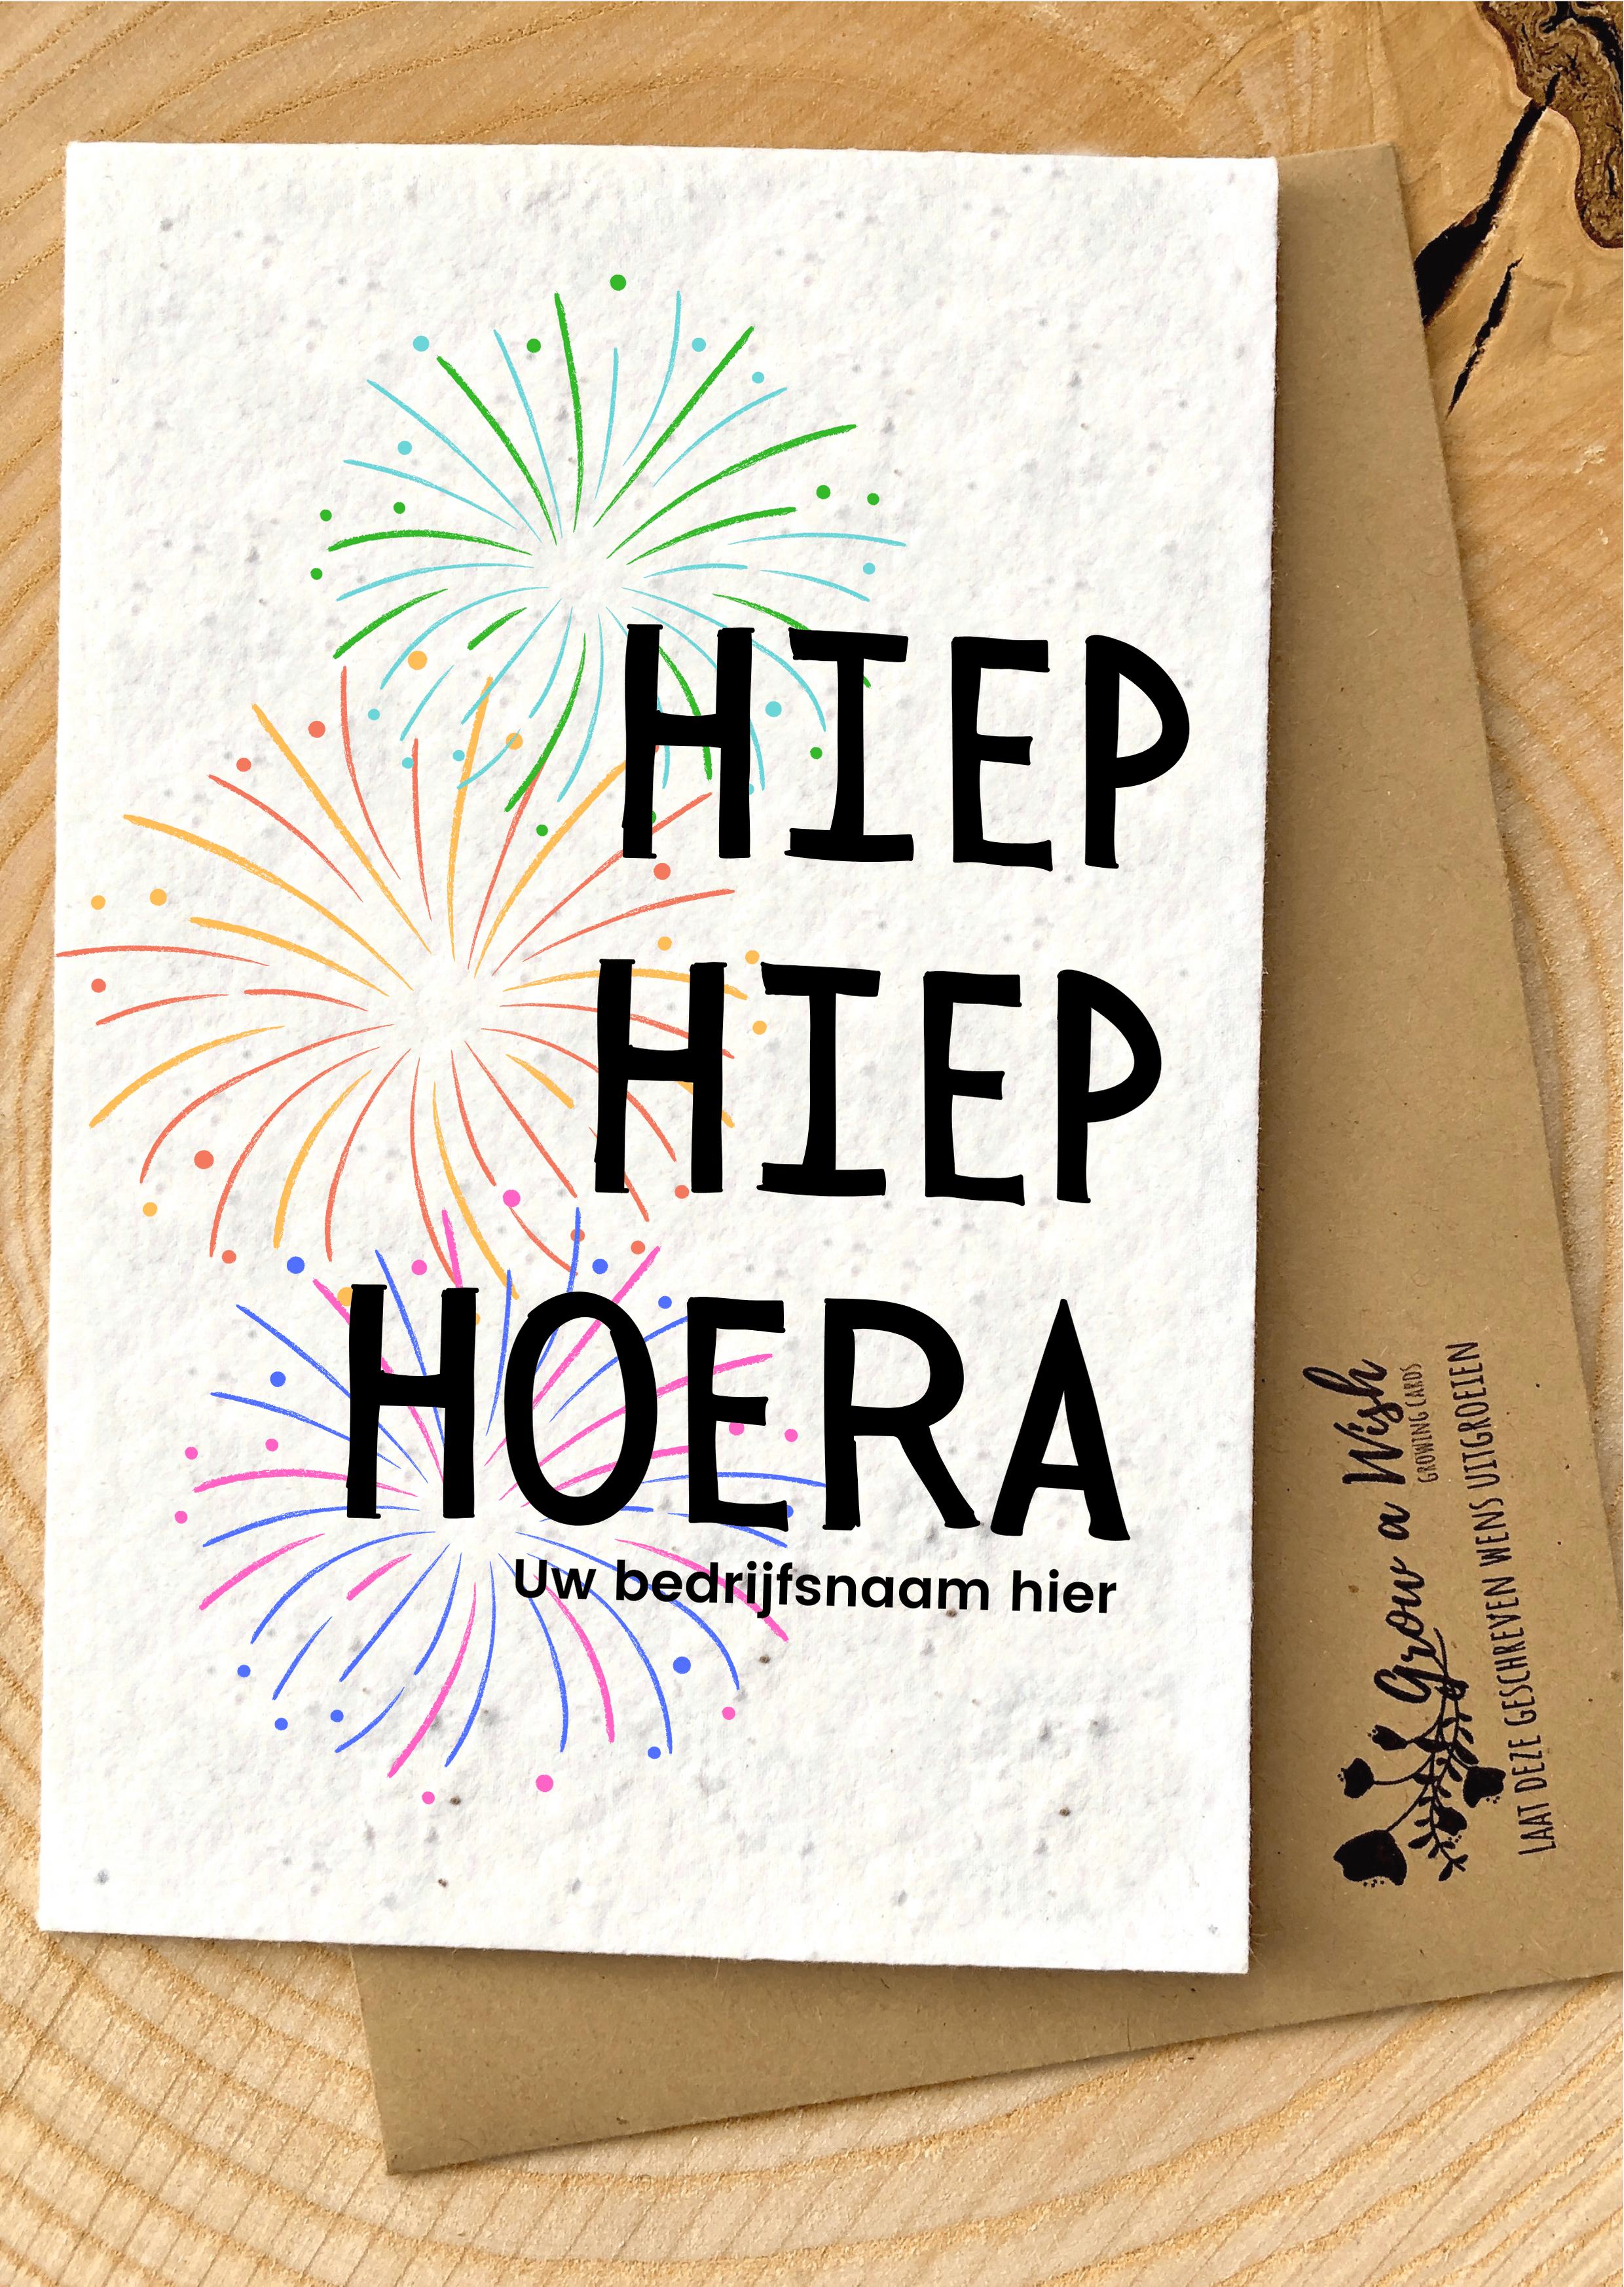 hiephiep (1)